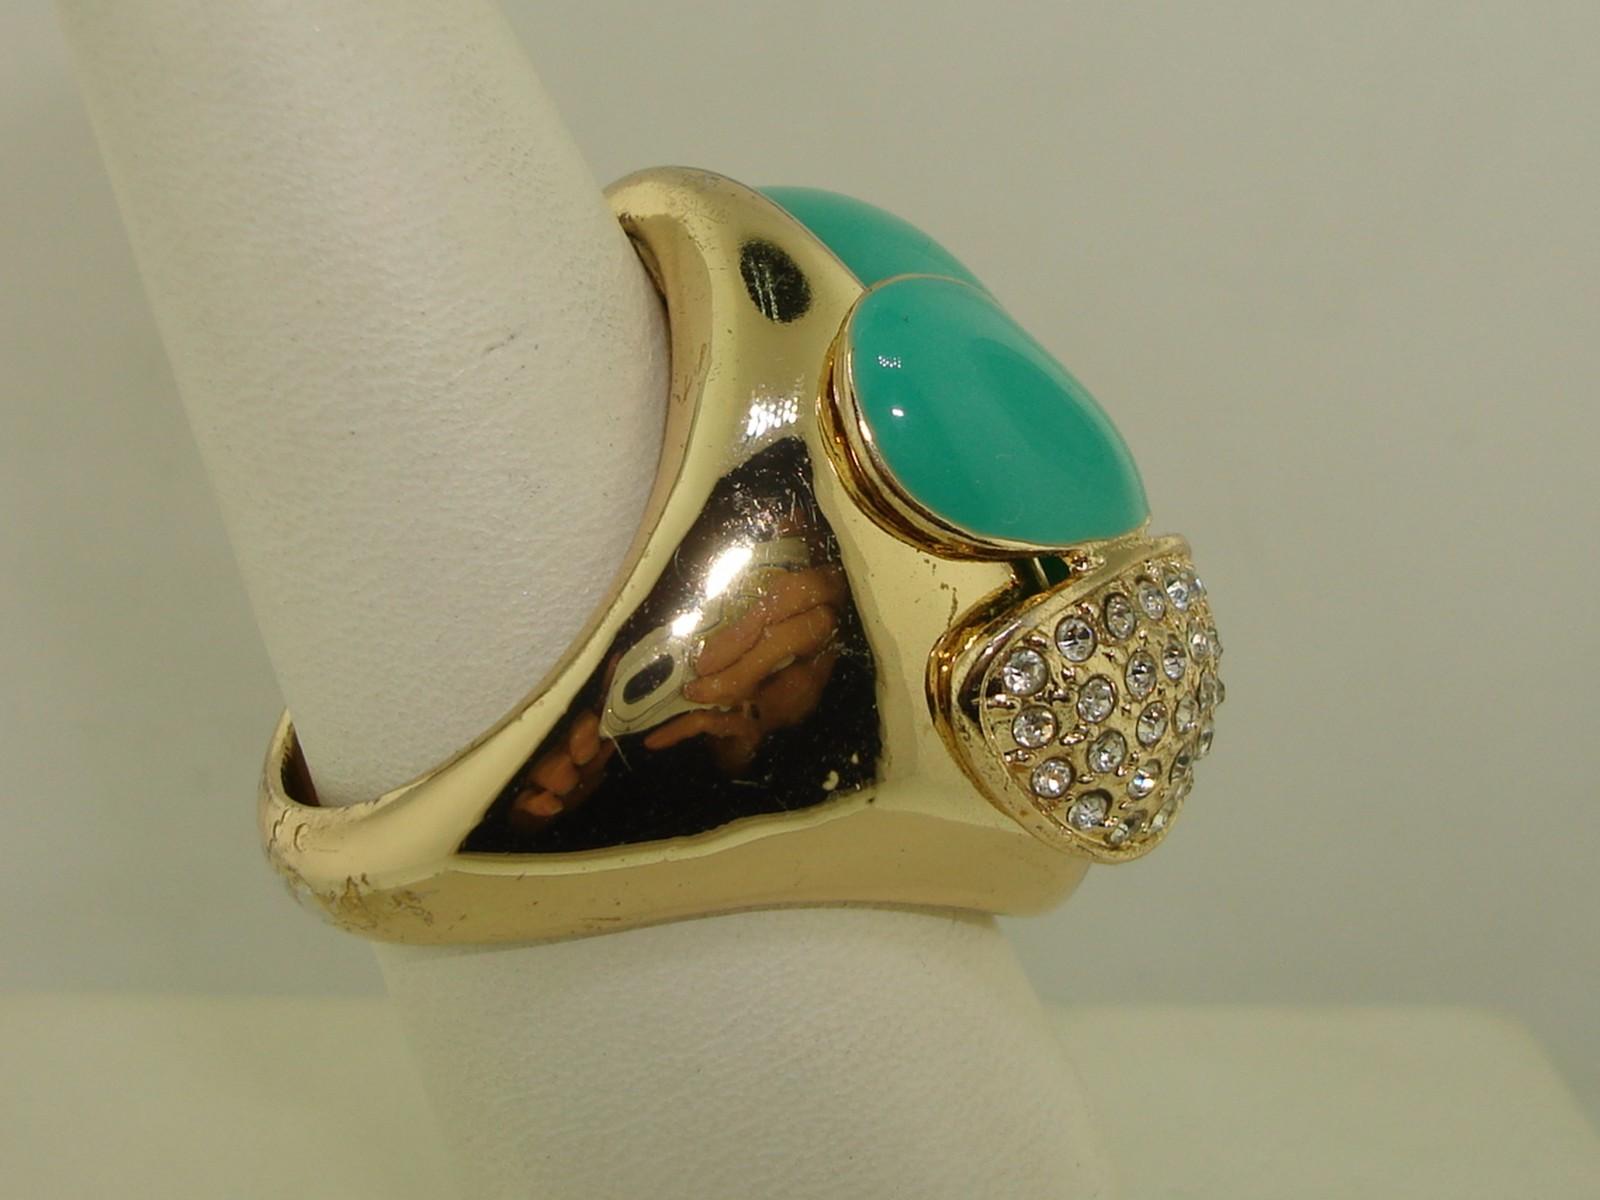 BEAUTIFUL TEAL BLUE & SPARKLING RHINESTONE FASHION RING! SZ 10